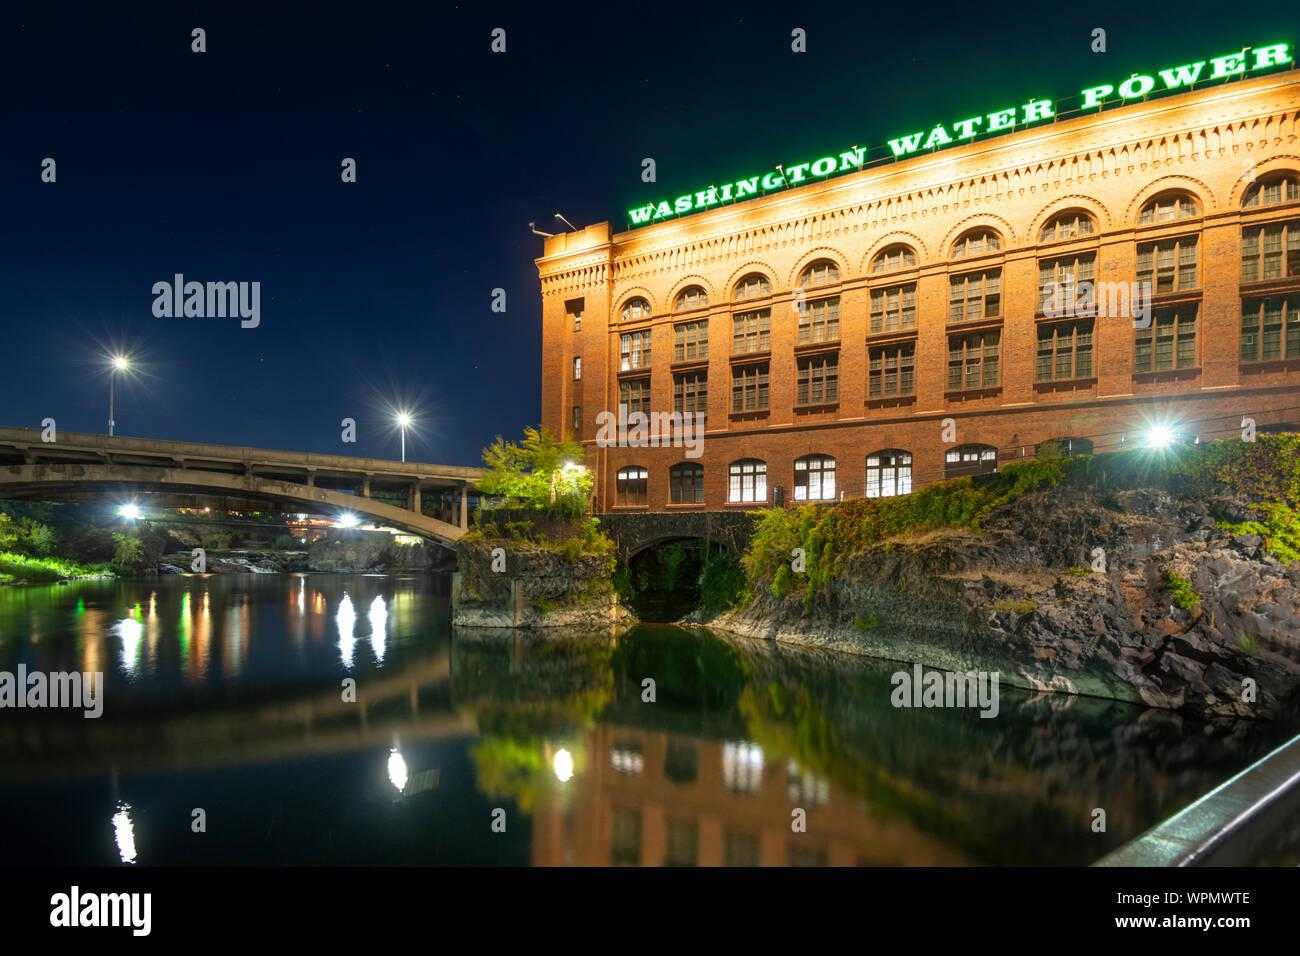 The Washington Water and Power building shines above the Spokane River and Dam near Riverfront Park at night in Spokane, Washington, USA Stock Photo